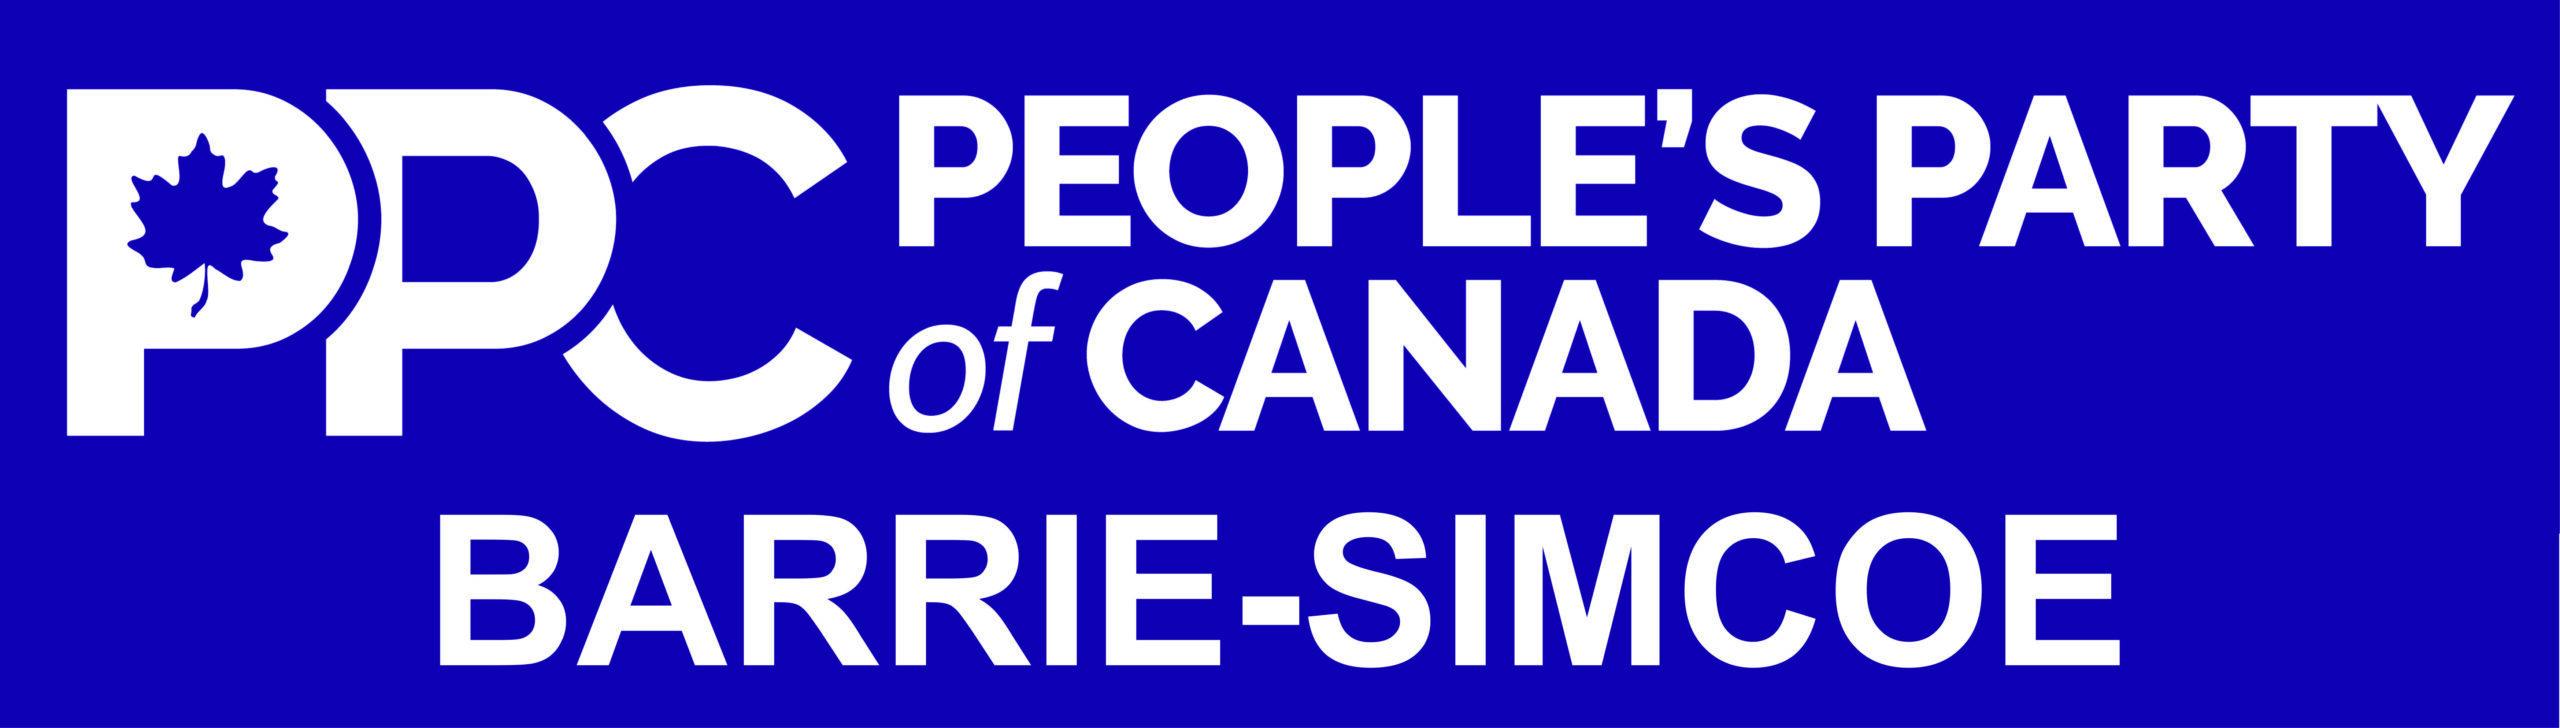 PPC Barrie Simcoe Website